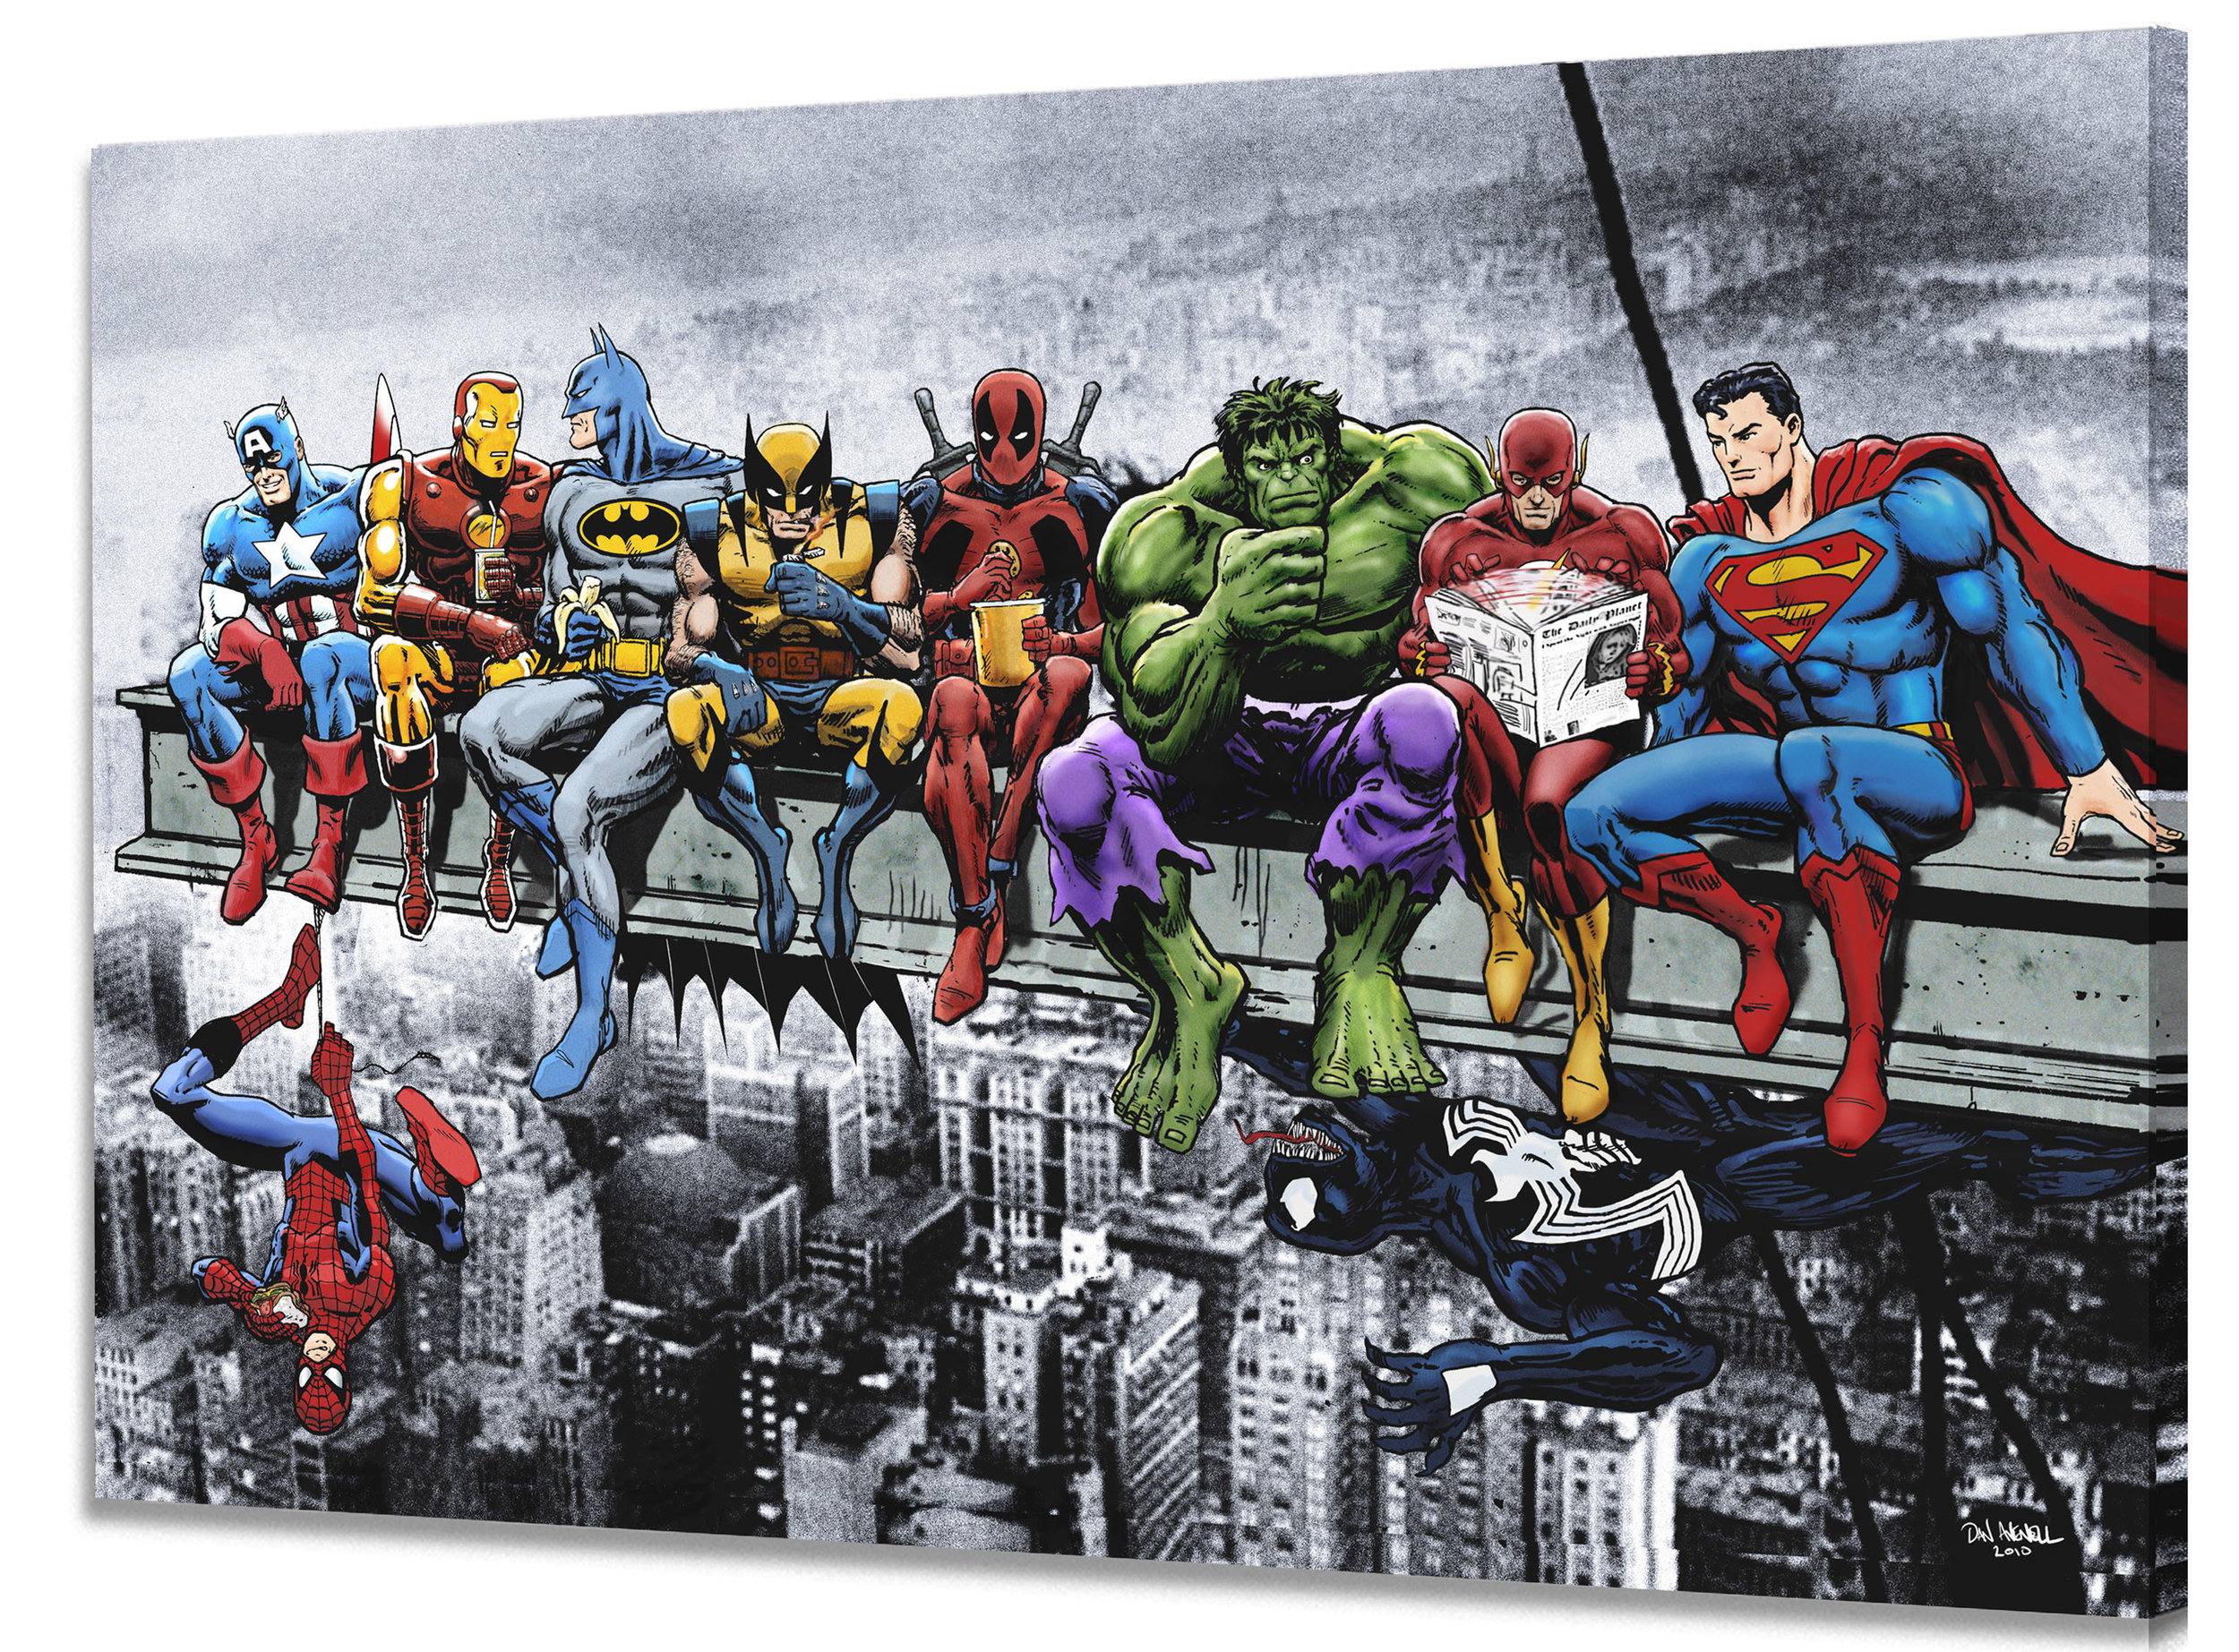 Superheroes Lunch Atop A Skyscraper